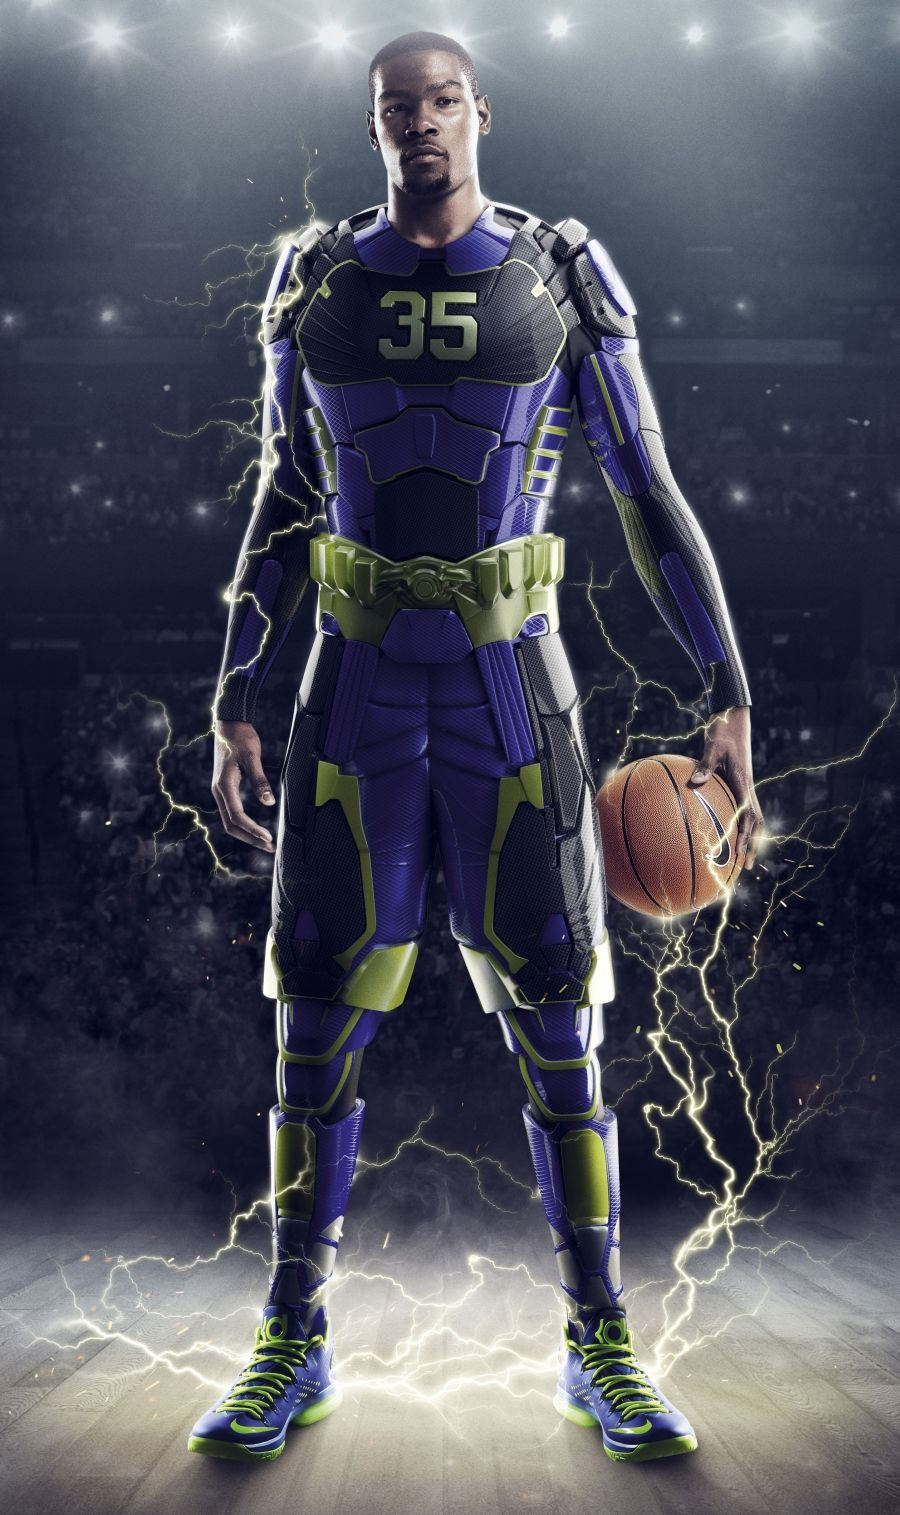 nike basketball elite series 20 graphic design